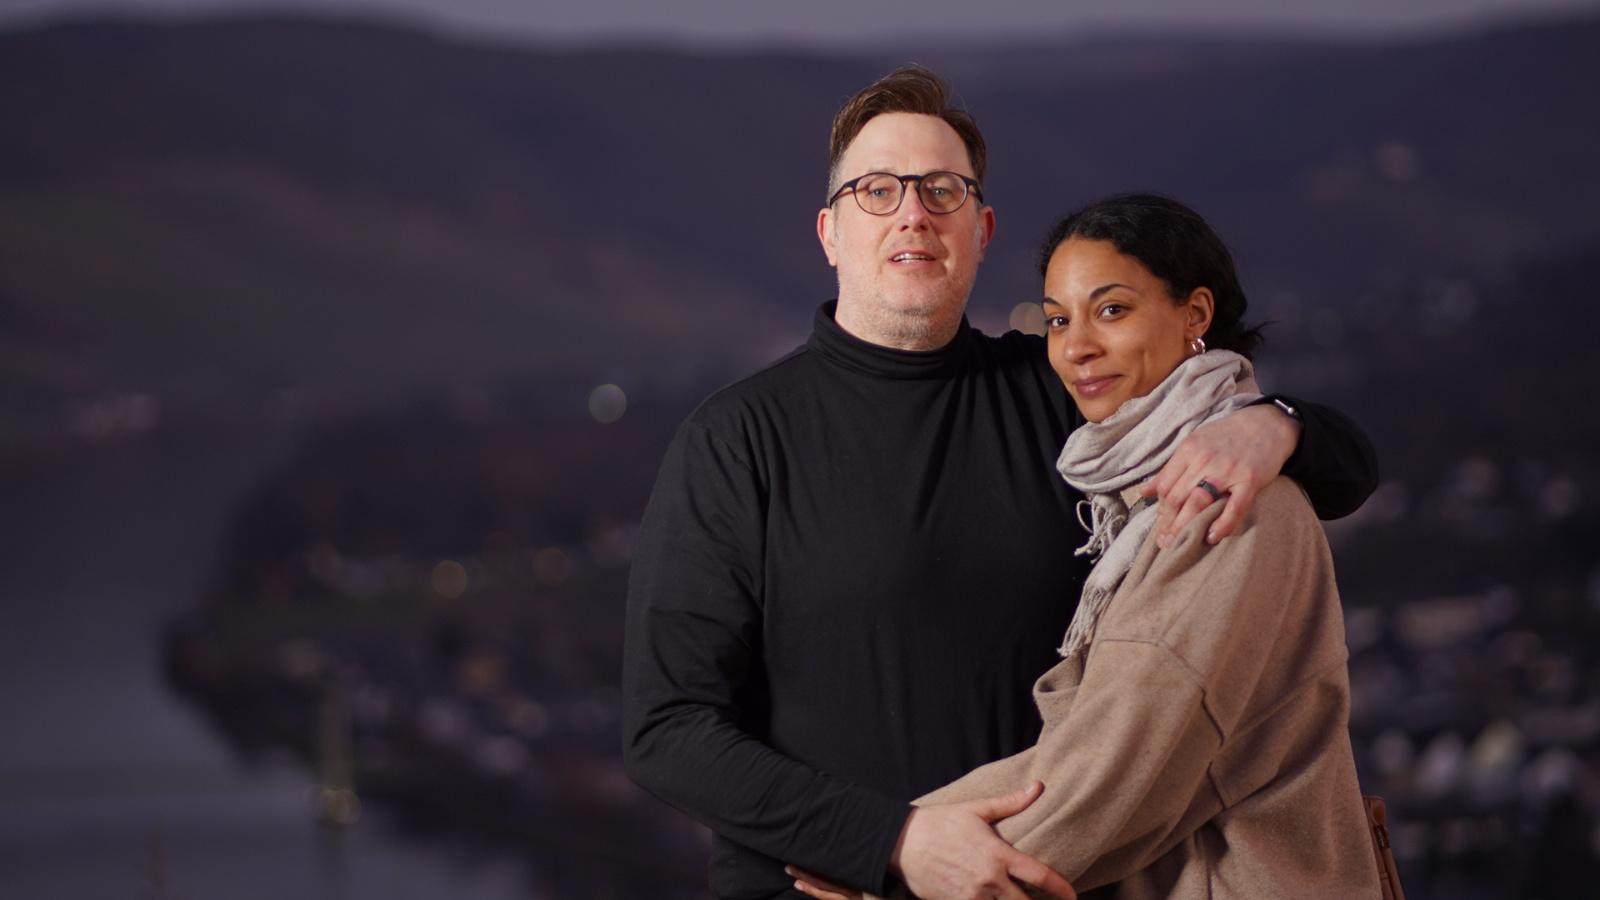 Lisa und Johannes